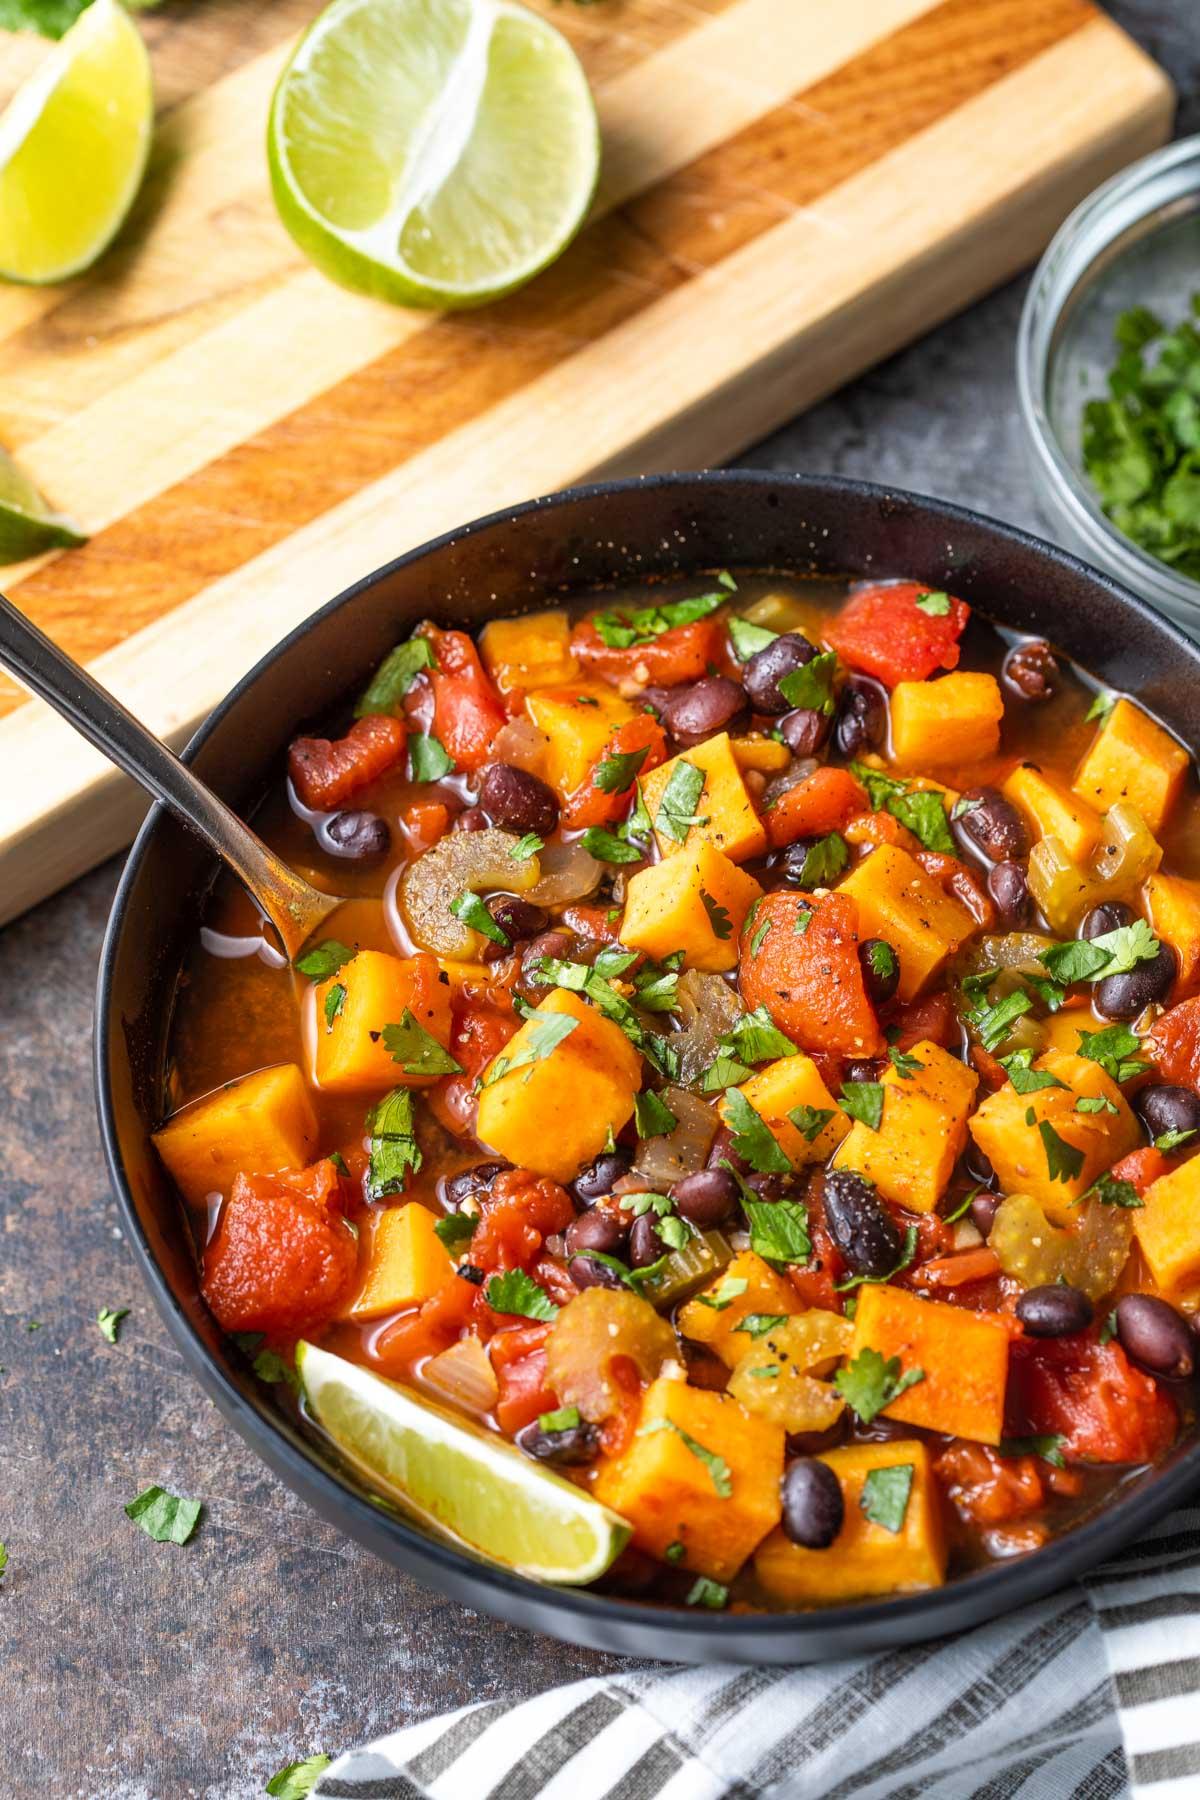 Overhead closeup of a bowl of sweet potato and black bean chili.